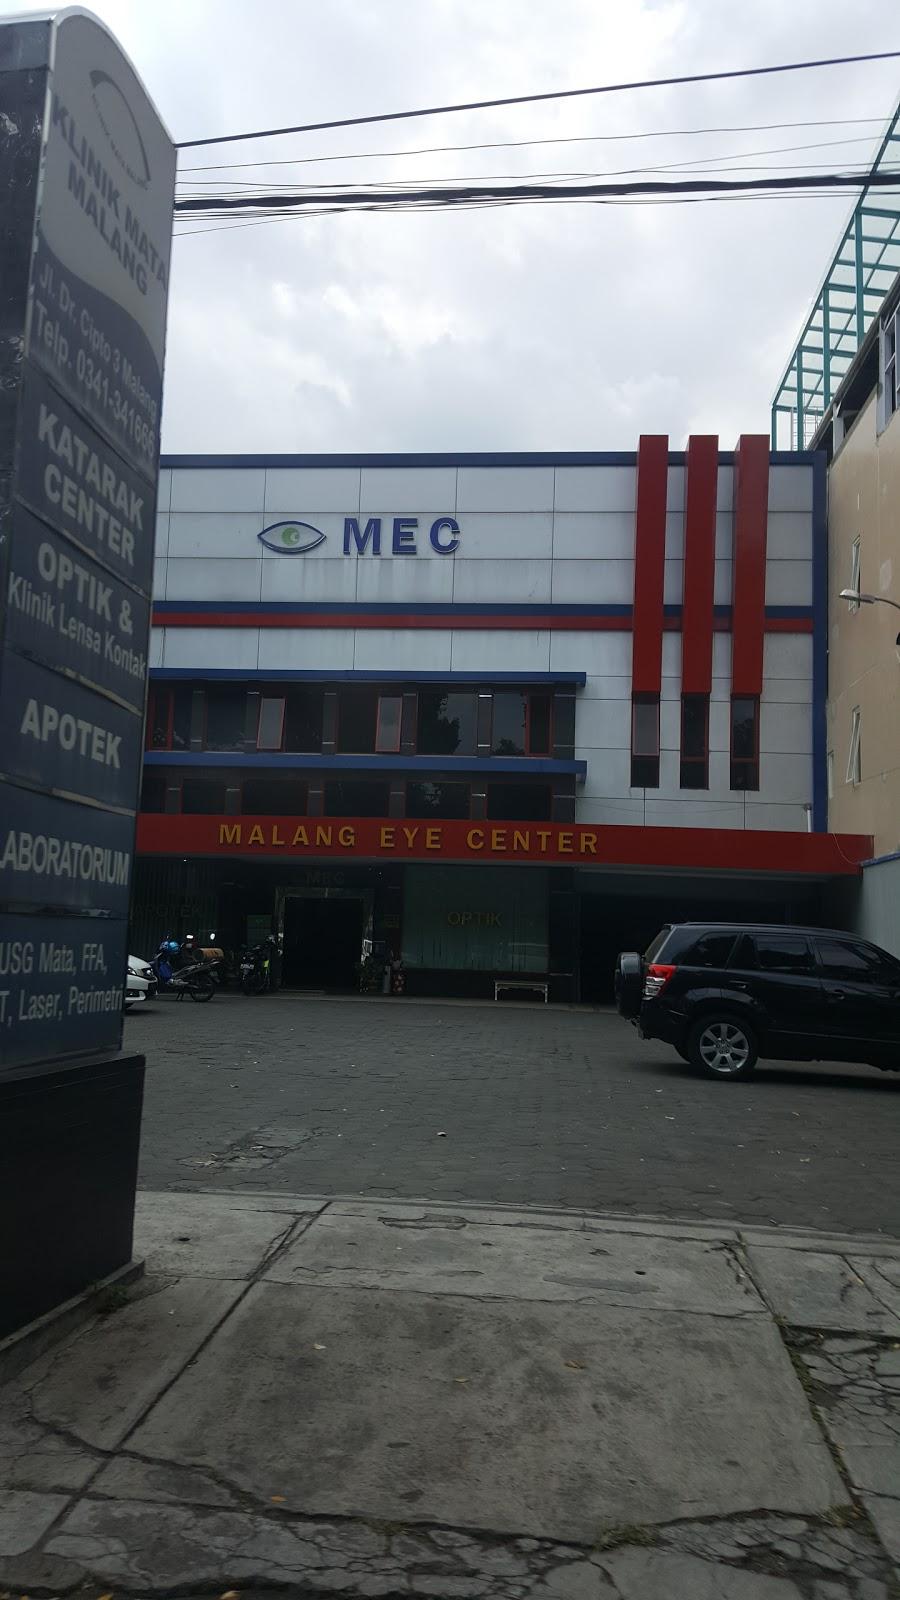 Apotek Malang Eye Clinic 62 341 341666 Jl Doktor Cipto No 3 71786 Rampal Celaket Klojen Kota Malang Jawa Timur 65111 Indonesia